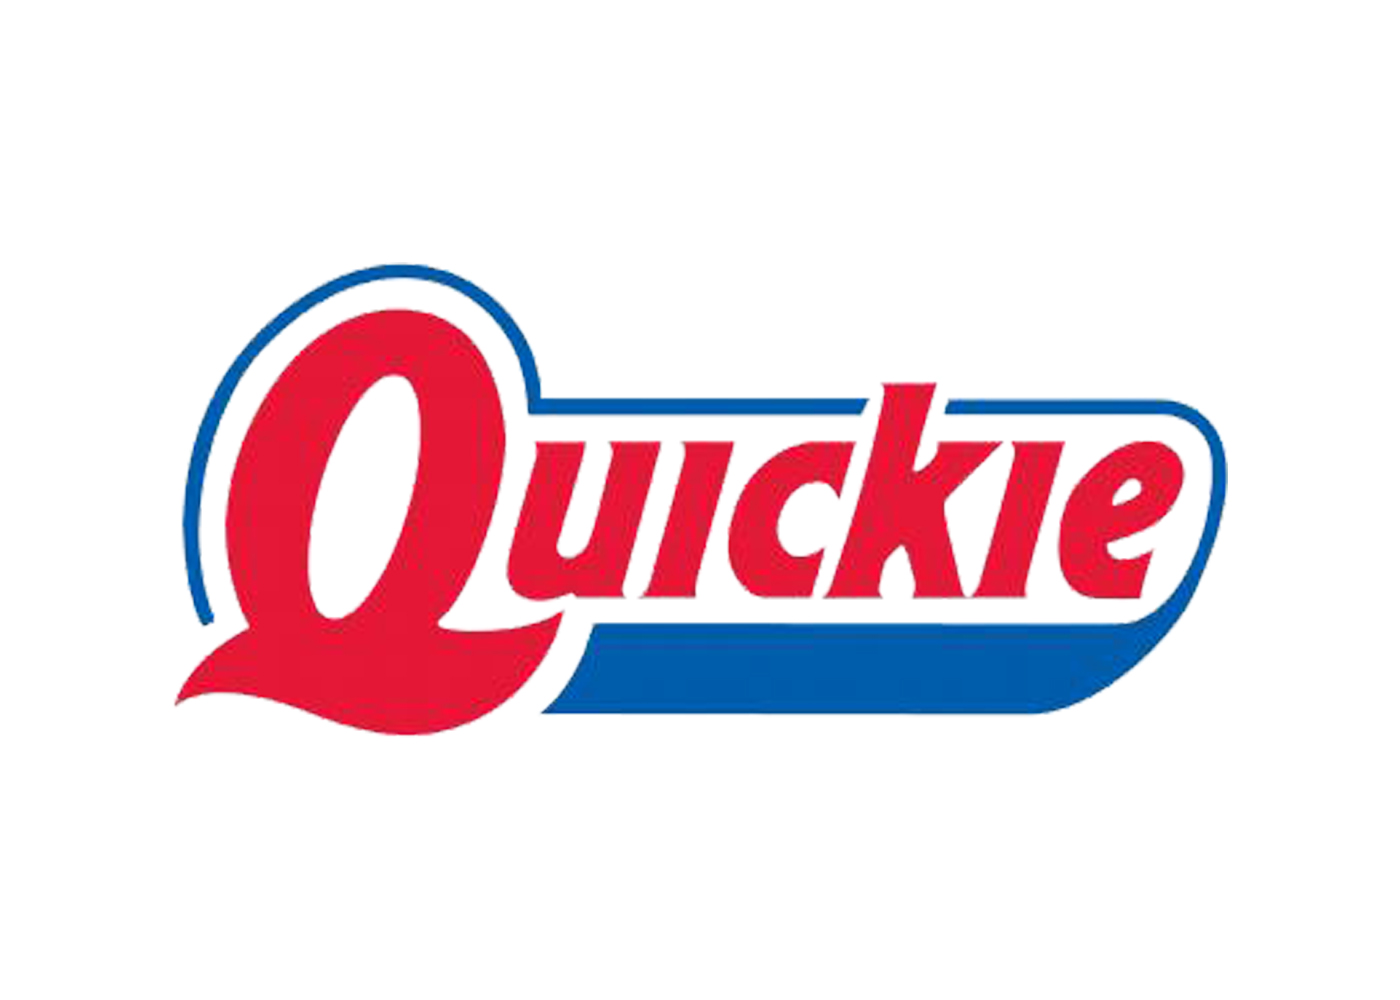 logo_Quickie.jpg